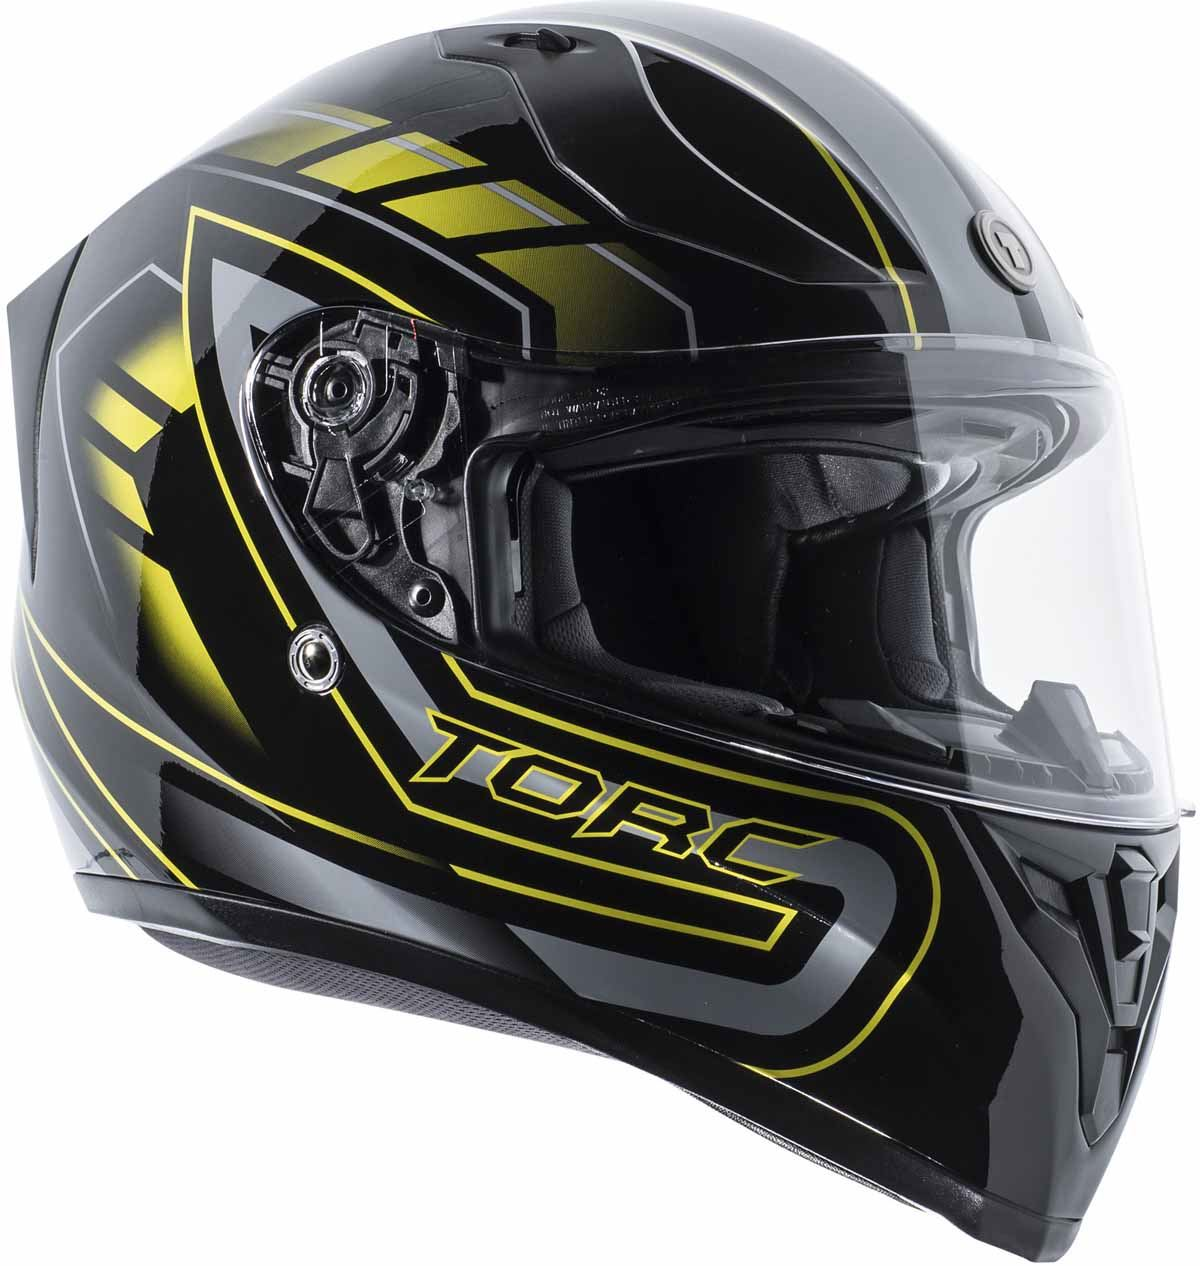 miniature 29 - Torc T15 T15B Helmet Bluetooth Blinc or without - Inner Sun Shield DOT XS-2XL